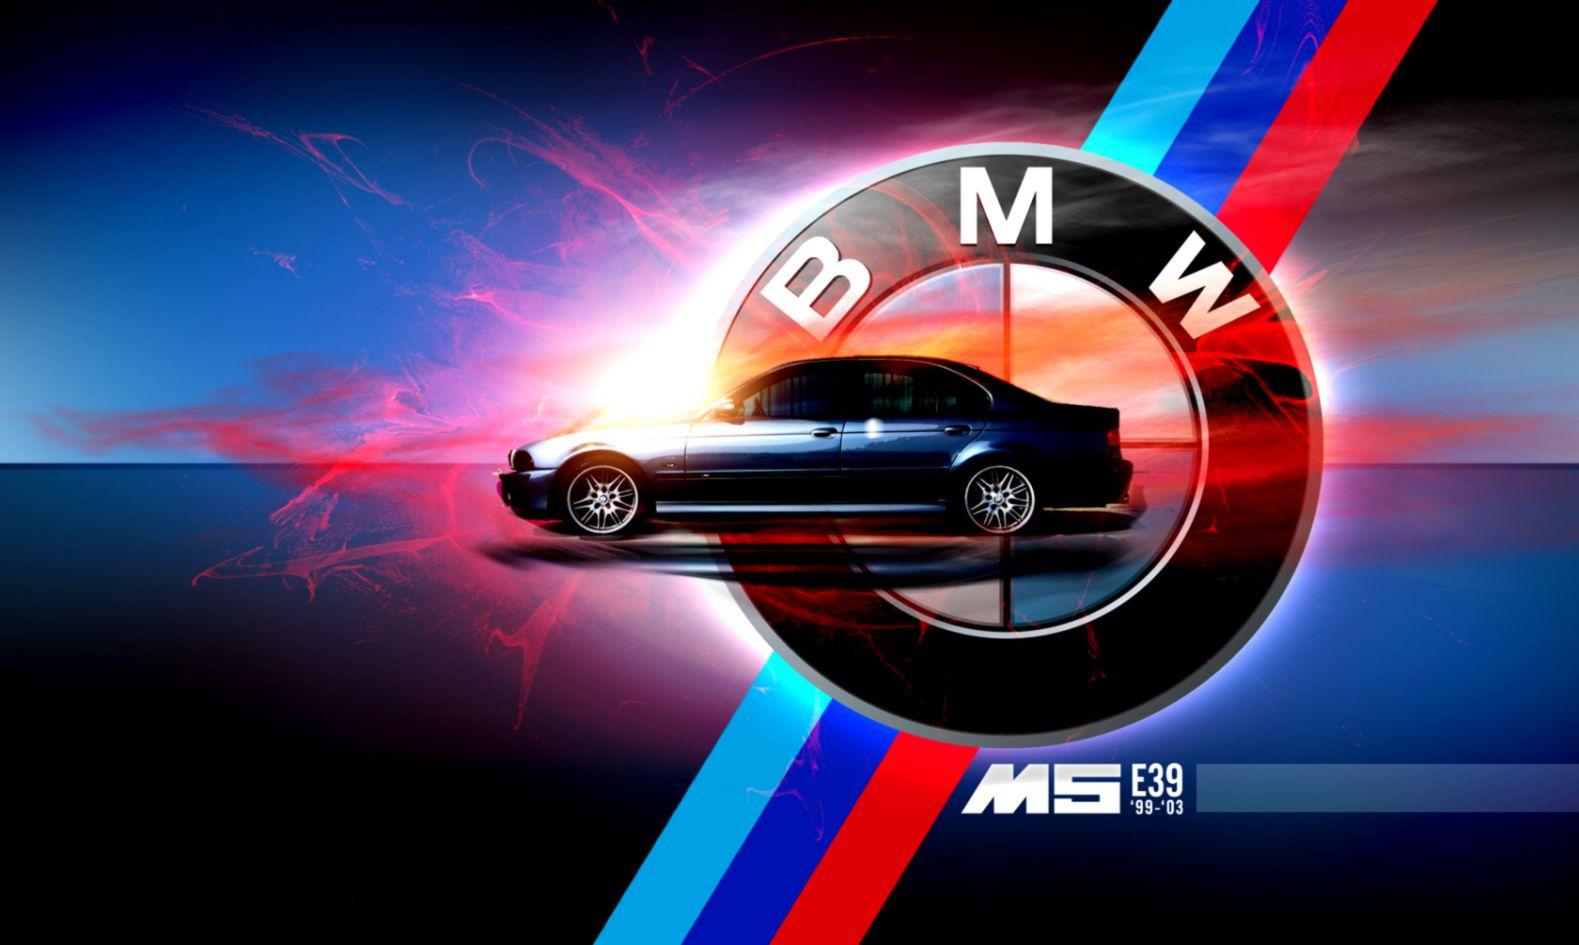 Bmw M5 Logo Hd Wallpaper | Best HD Wallpapers